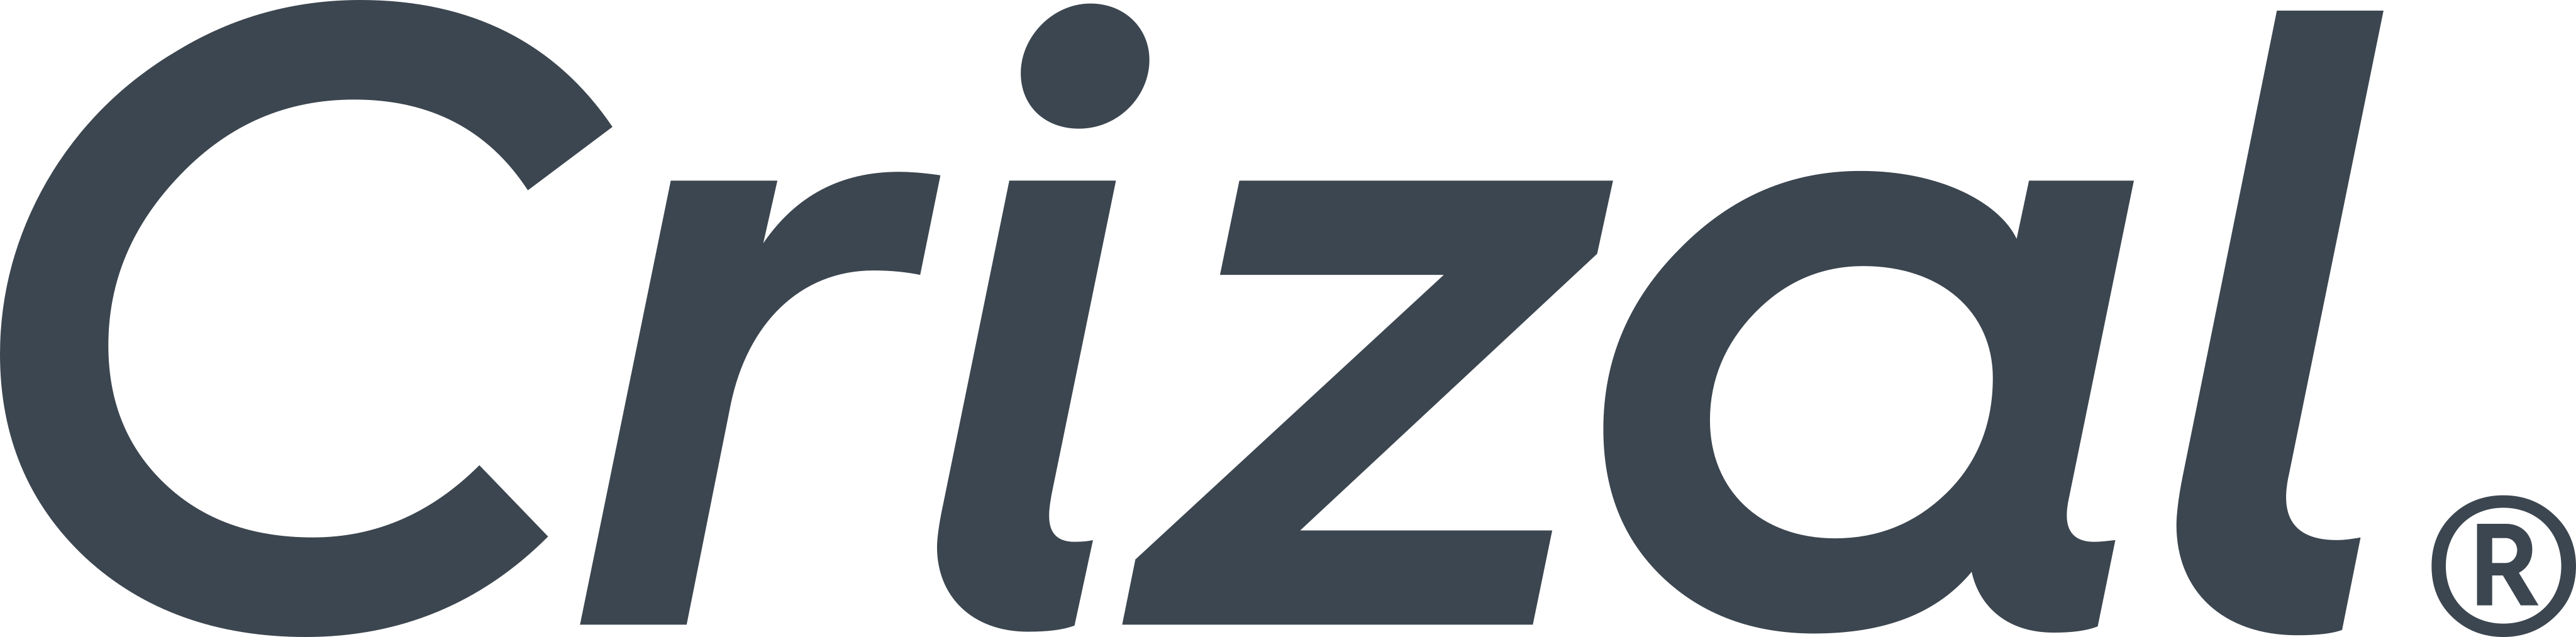 Crizal Logo.